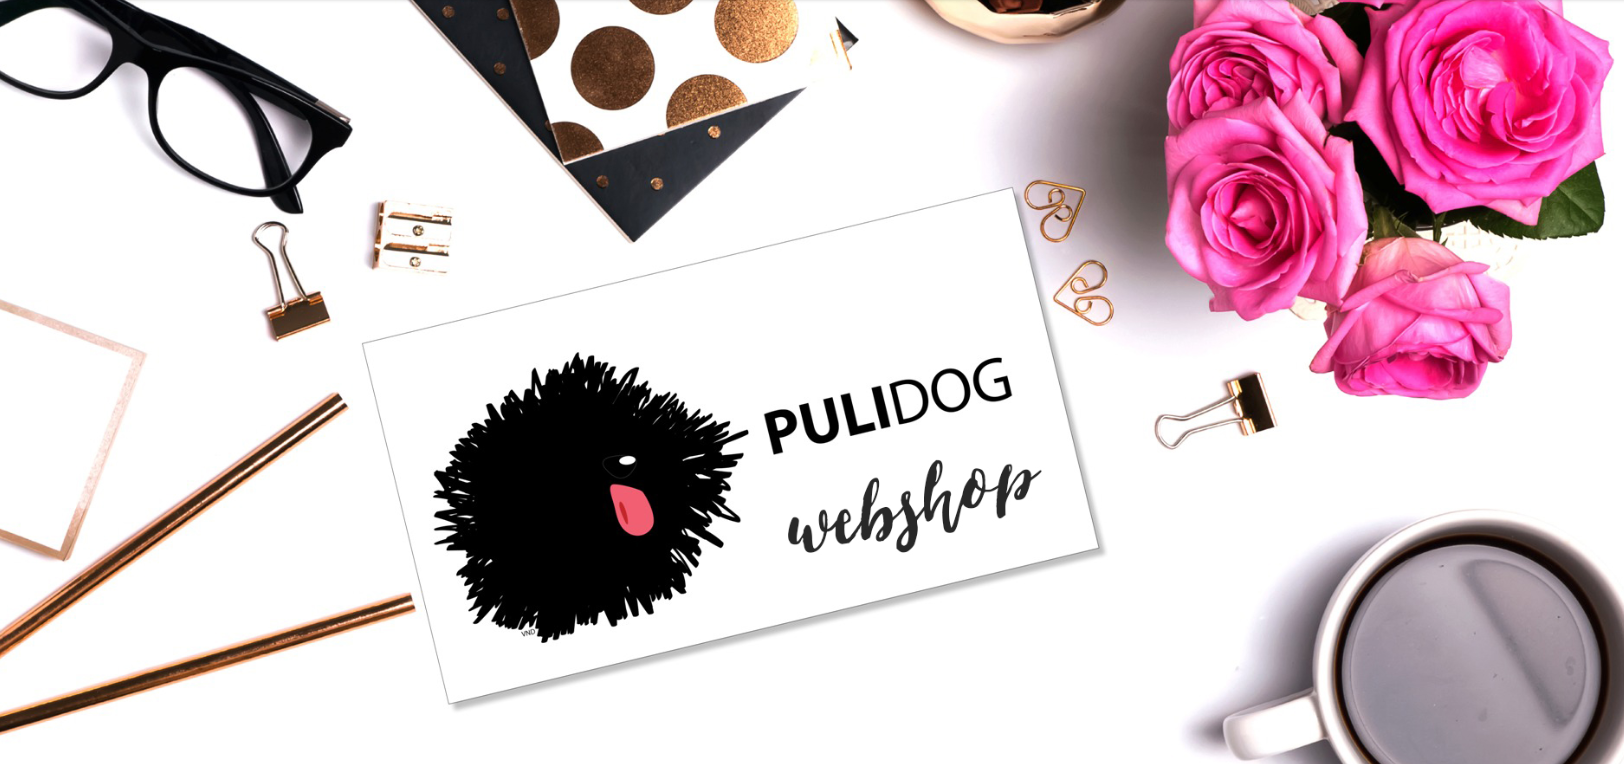 Pulidog